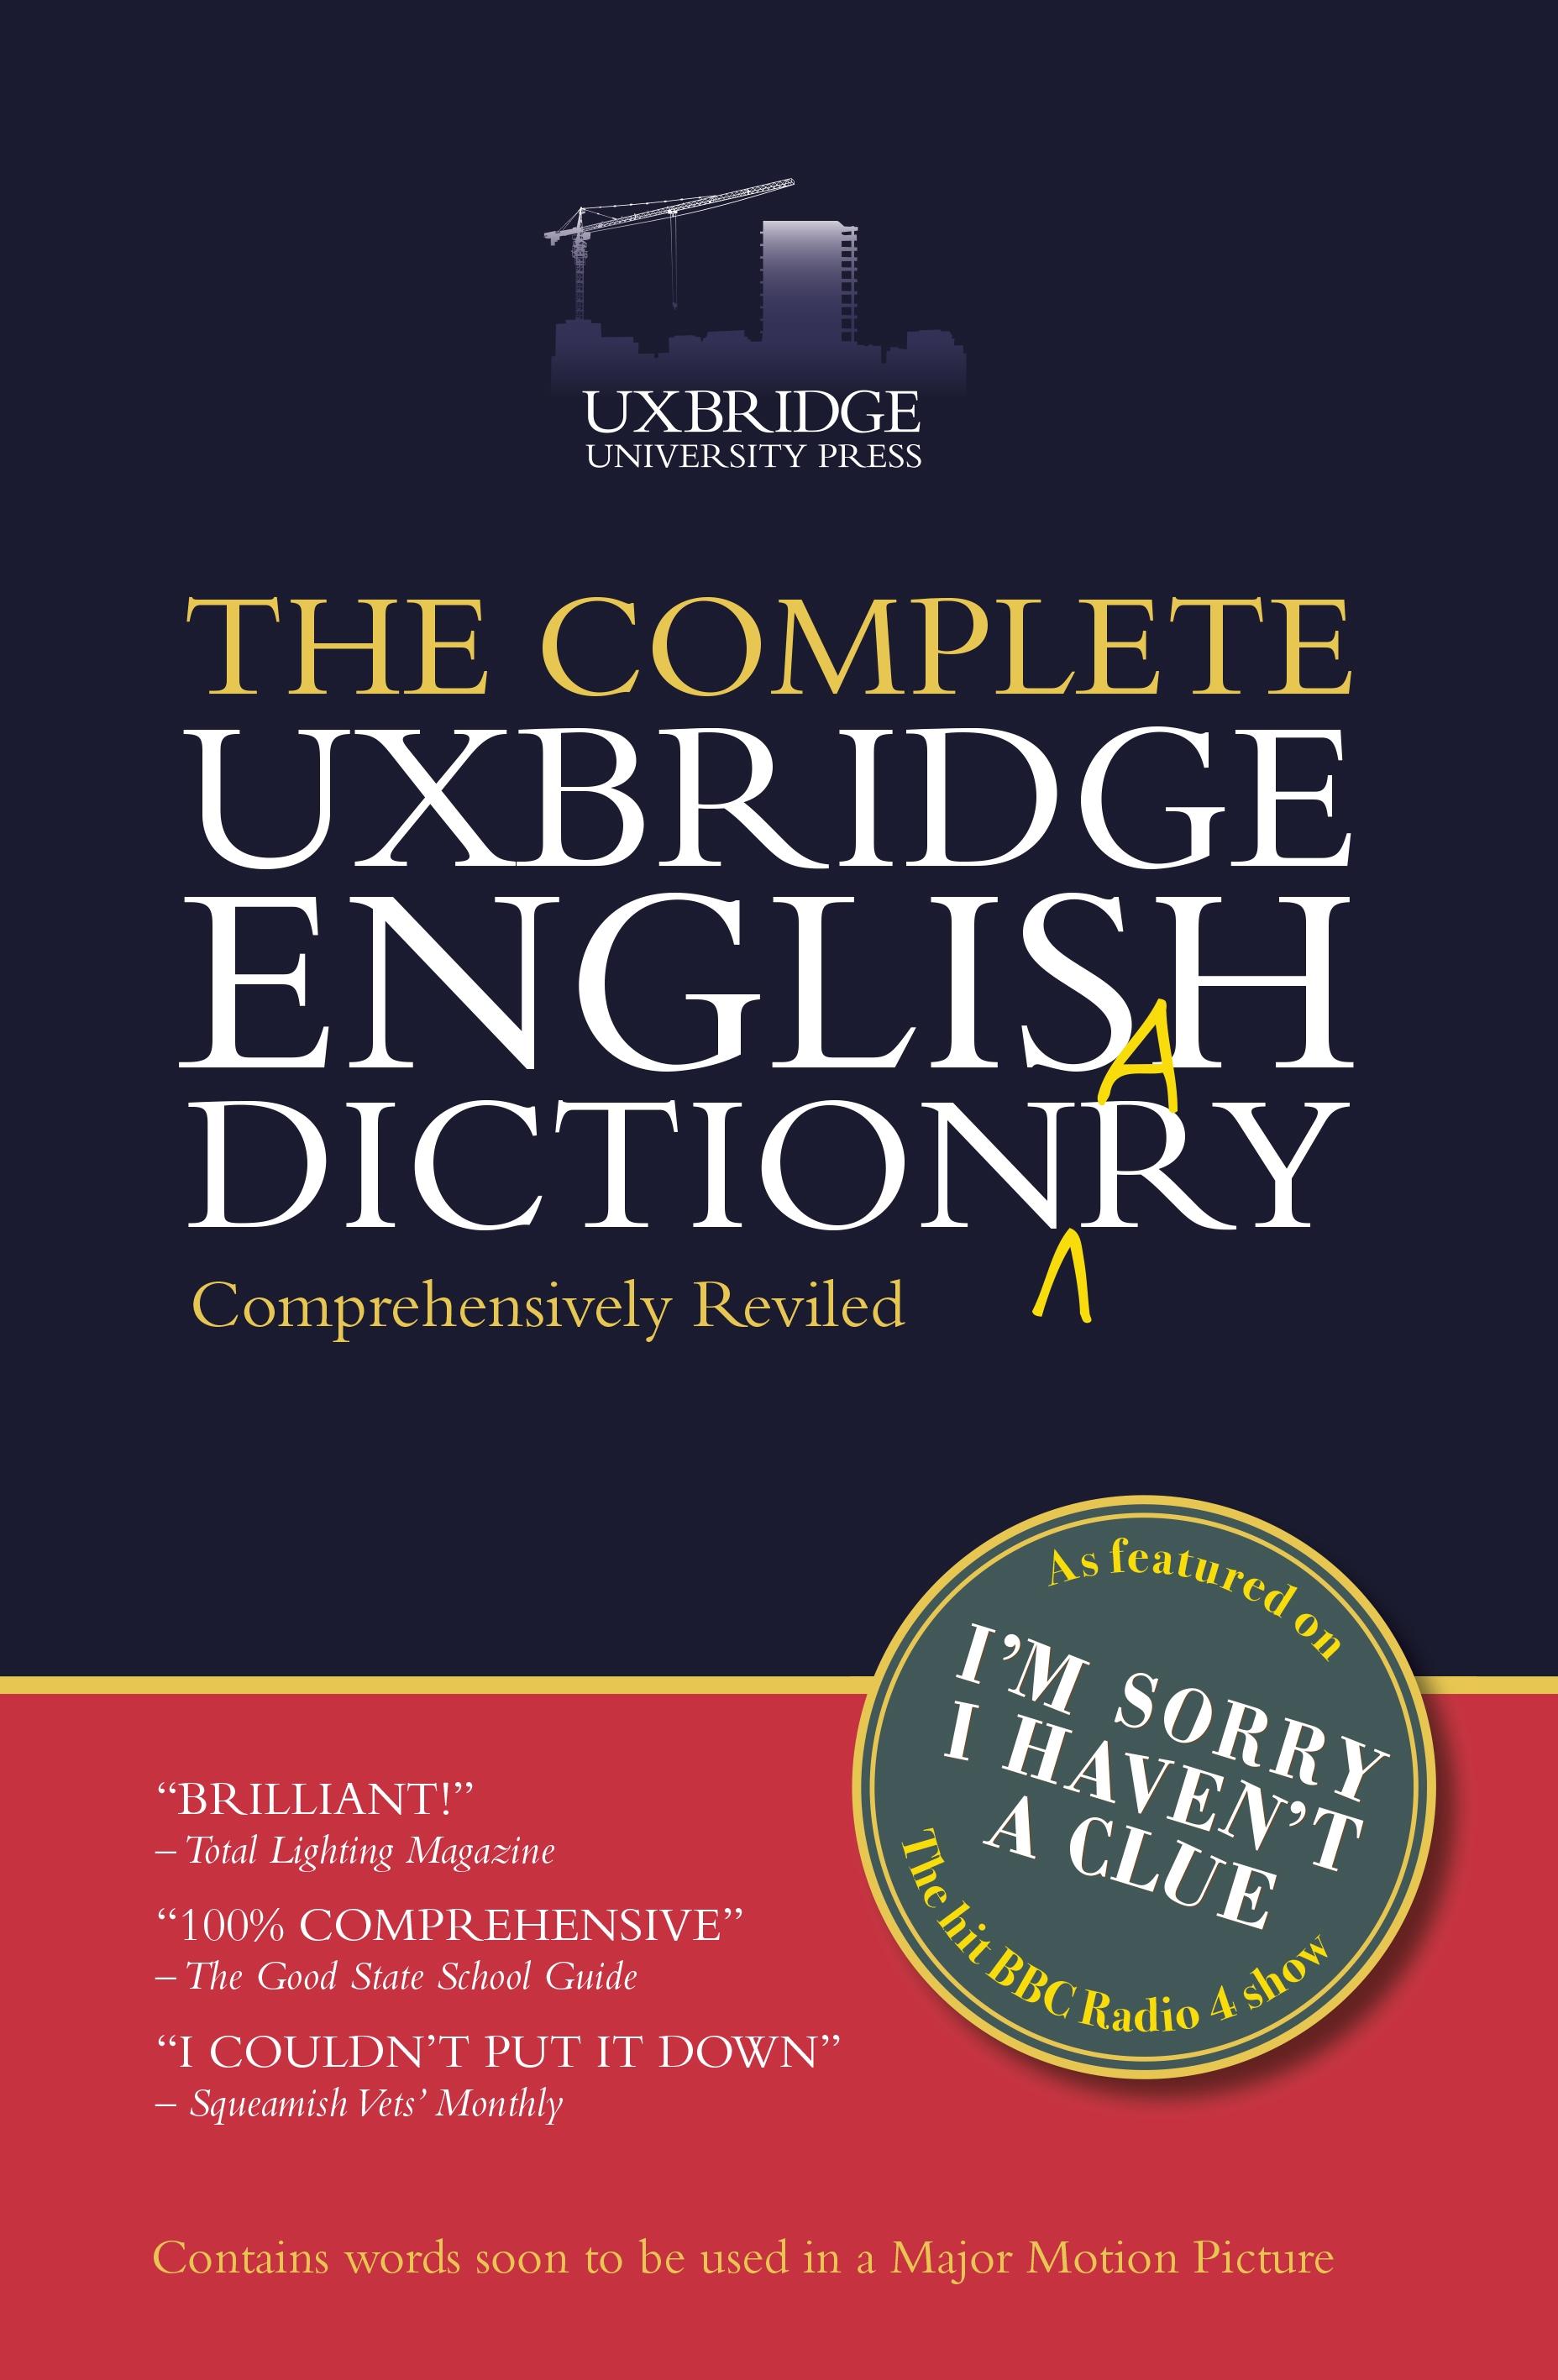 English In Italian: The Complete Uxbridge English Dictionary By Graeme Garden